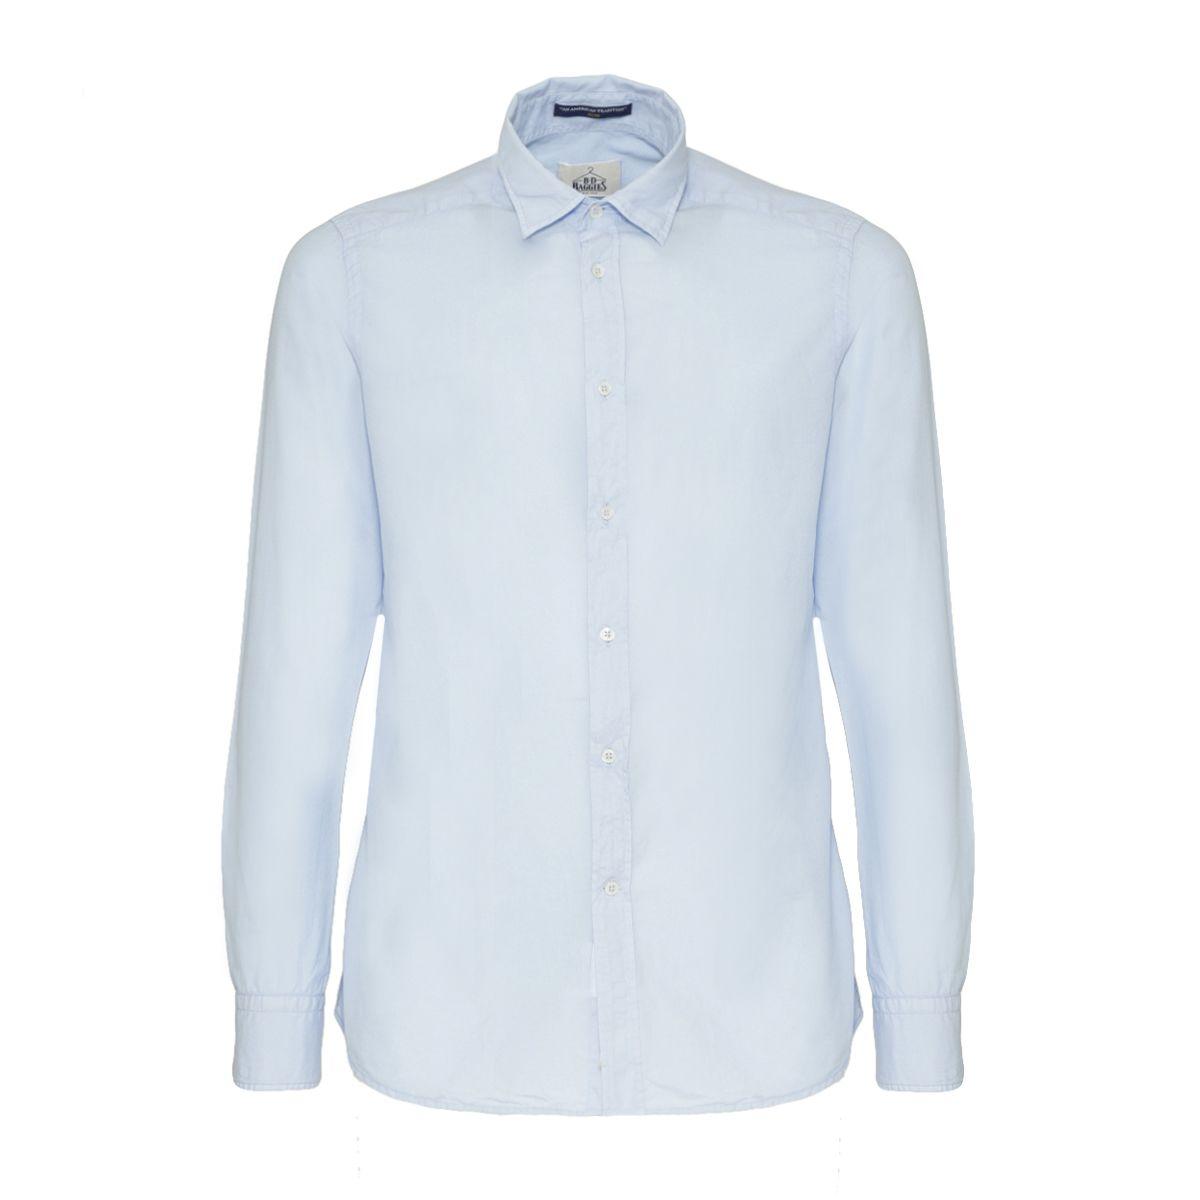 B.d.baggies Classic Shirt